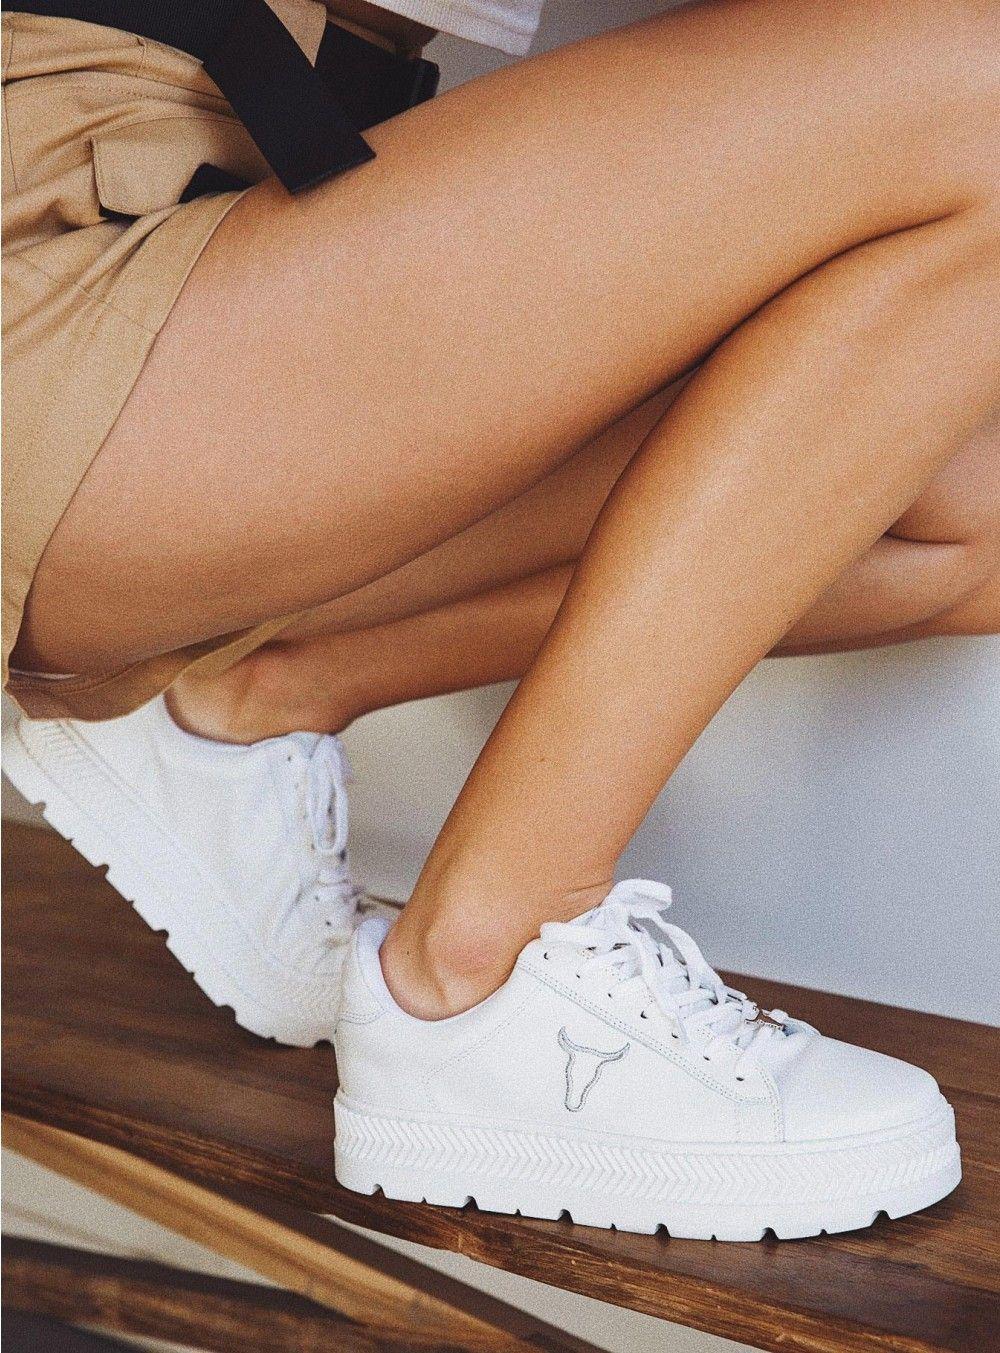 946e8fac60e Windsor Smith Kyla Sneakers - right side view